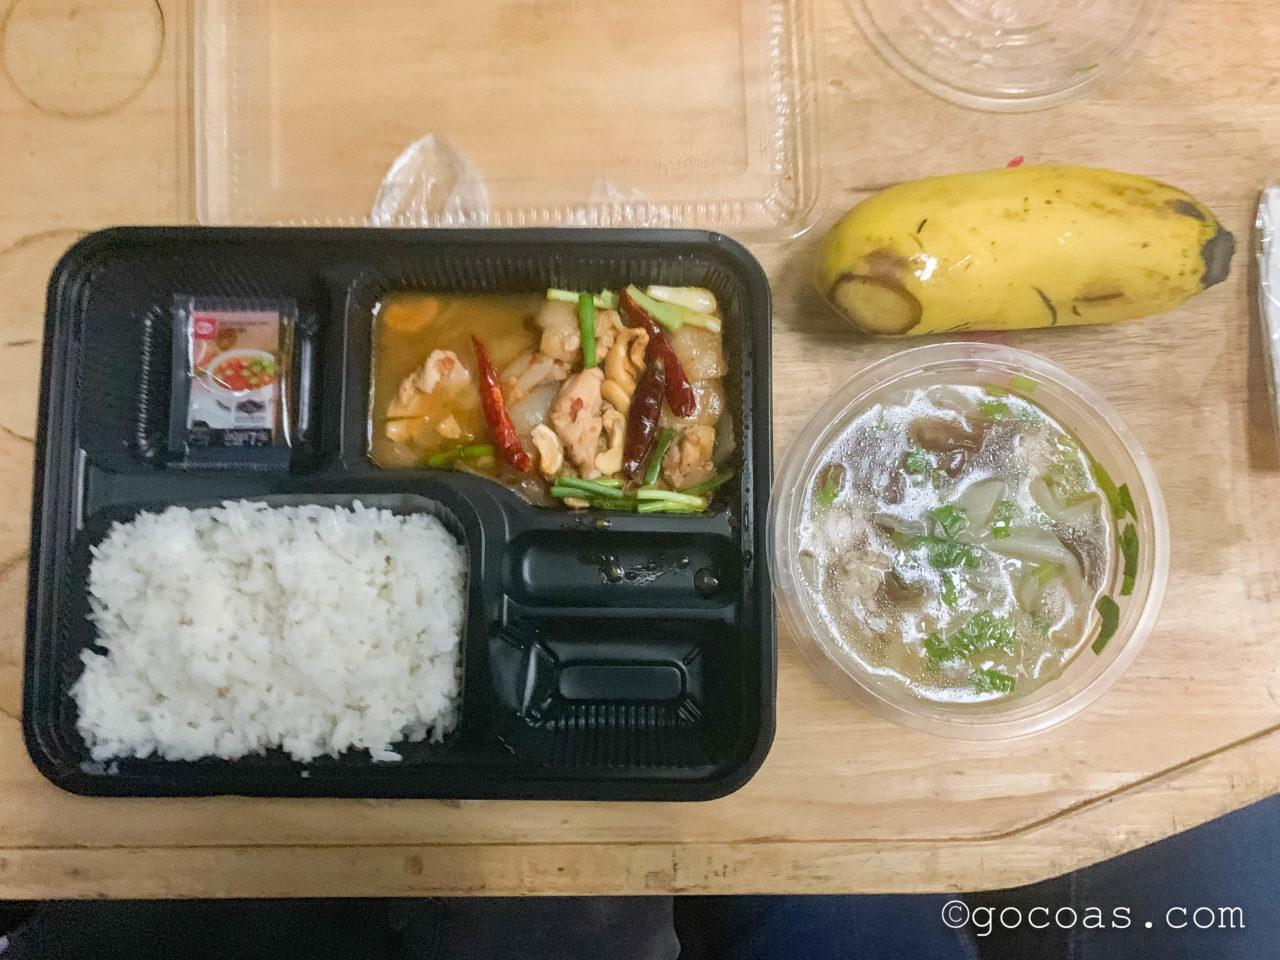 Hua Lamphong駅で乗った電車内の座席のテーブルに置かれる晩ごはんのお弁当